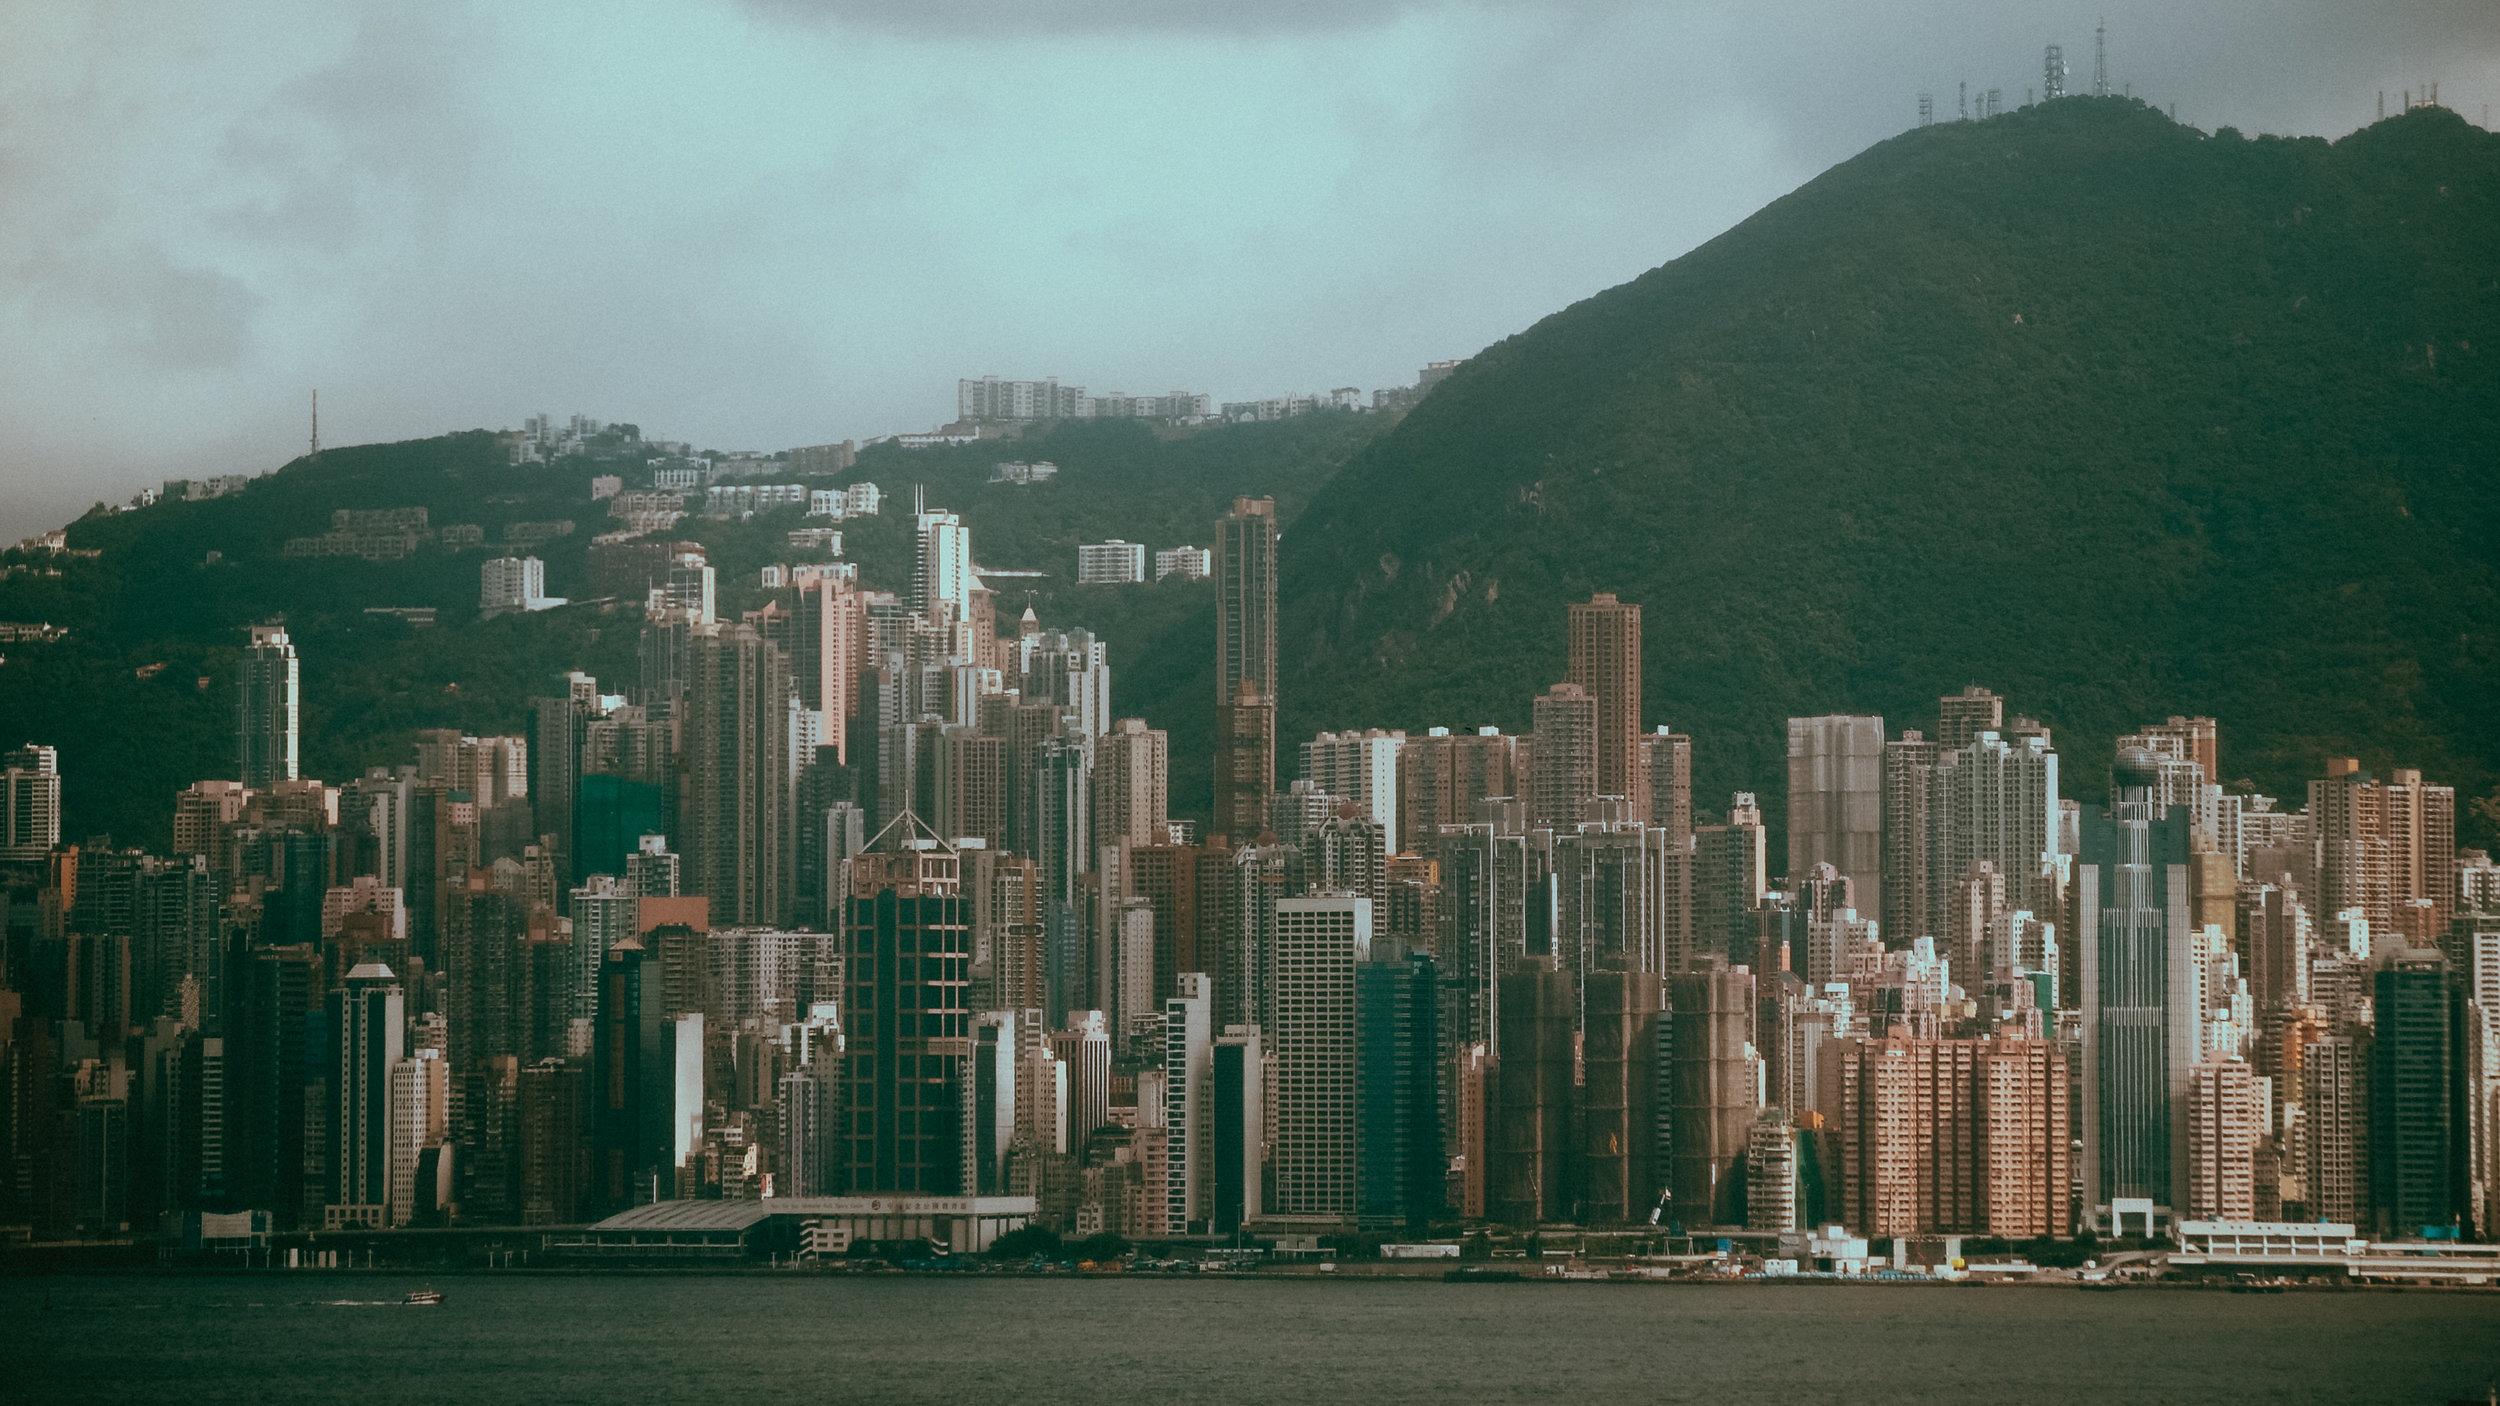 jonathan-burkhart-photographer-oklahoma-city-hongkong-china-1179.jpg